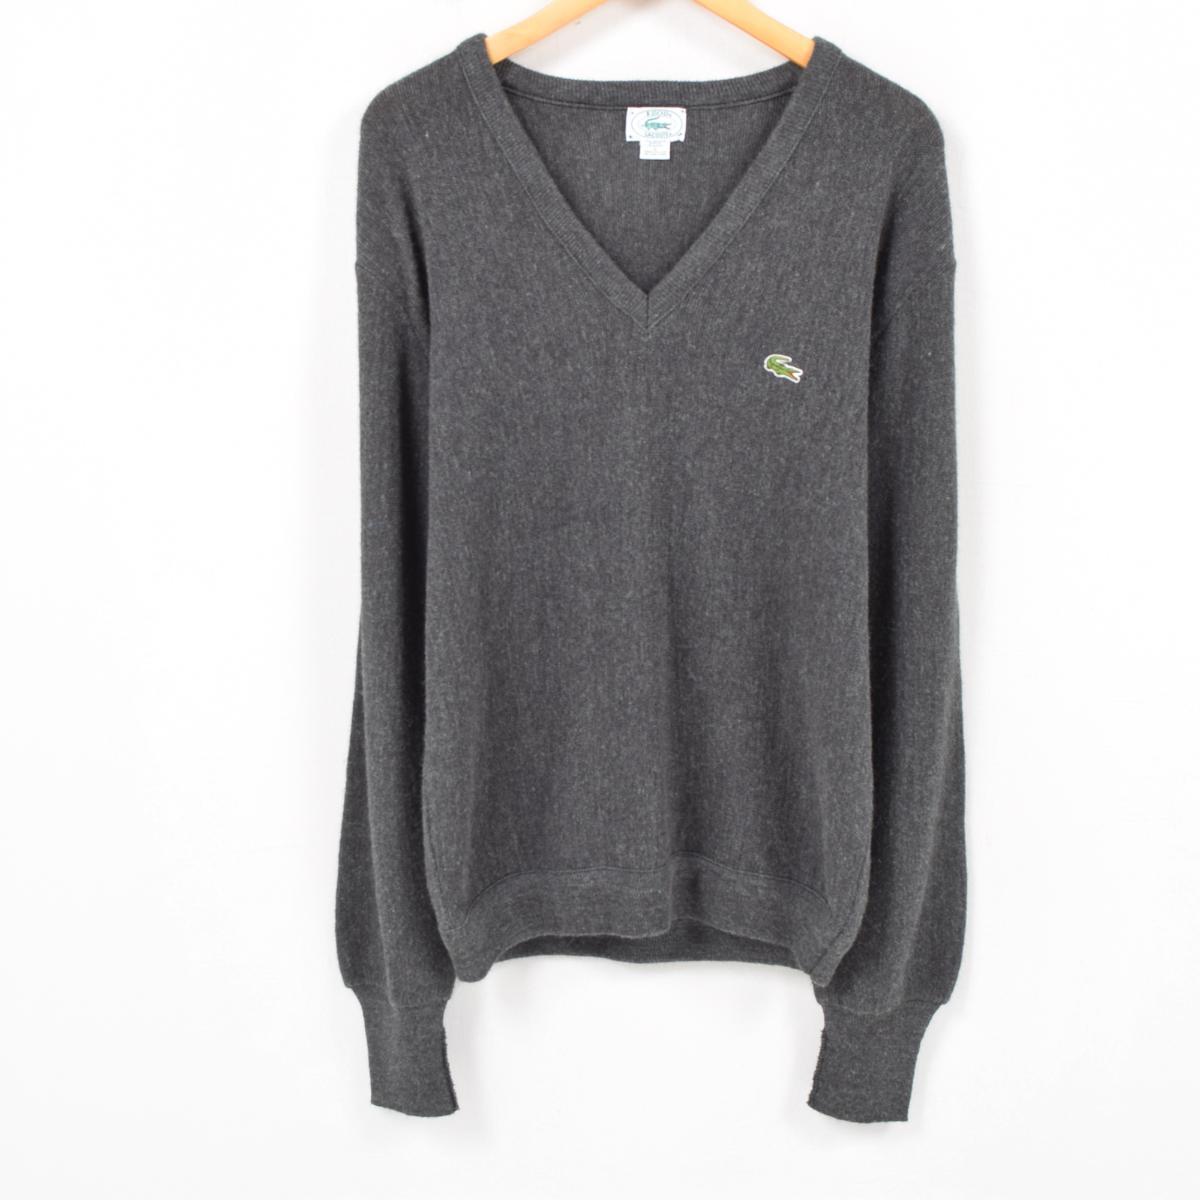 529084b891b85 Men L vintage /wap7759 in the 80-90 generation made in Lacoste LACOSTE IZOD  acrylic knit sweater USA